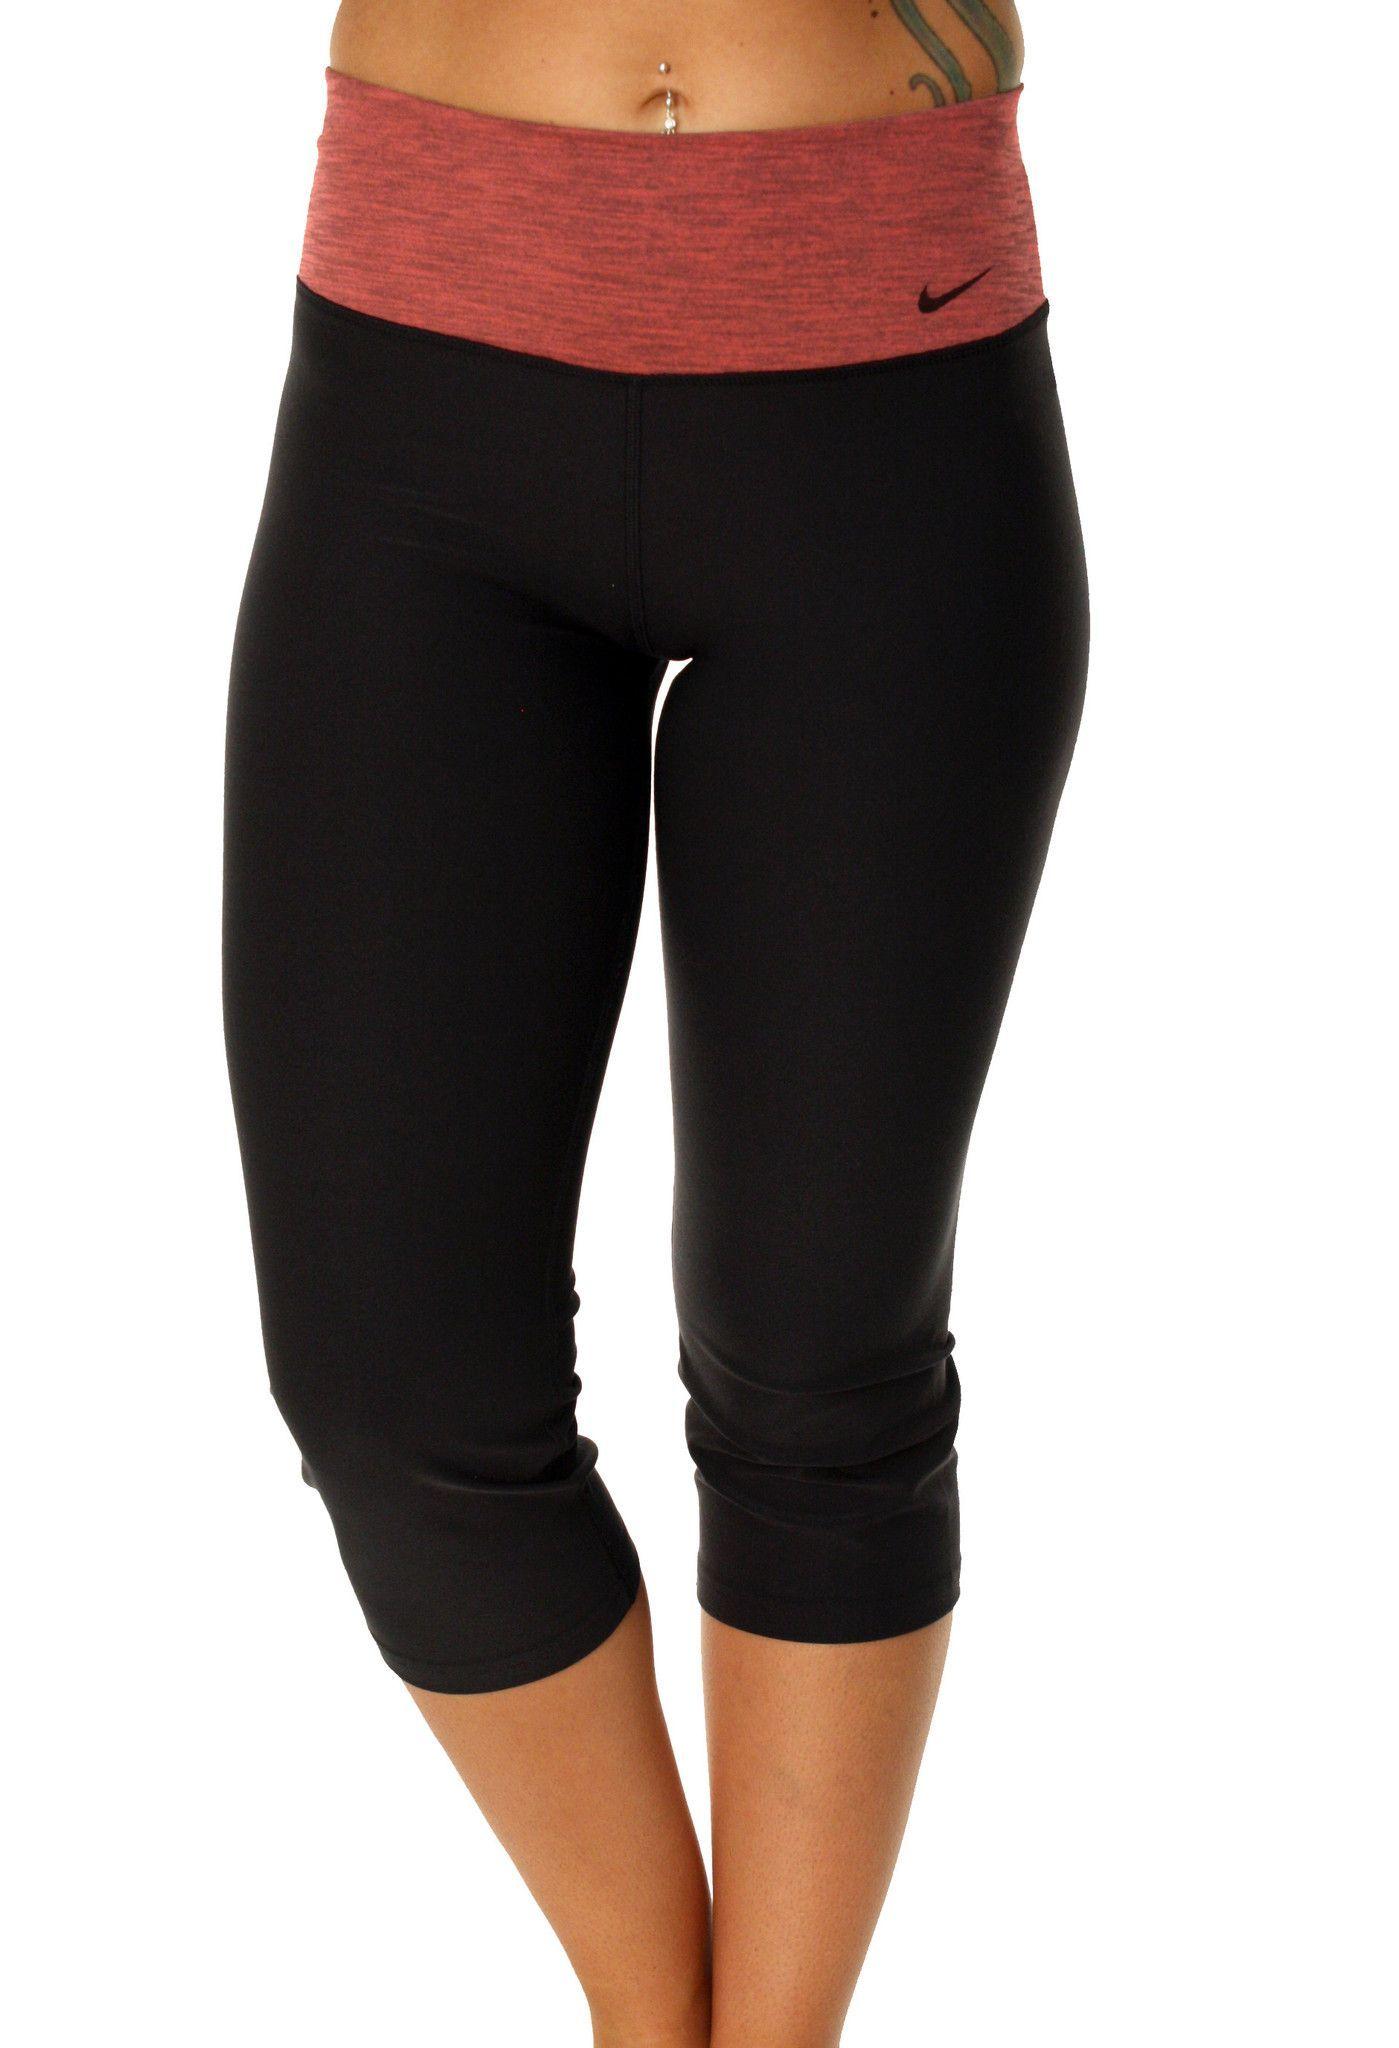 Nike womens drifit stay cool slim fit training capri